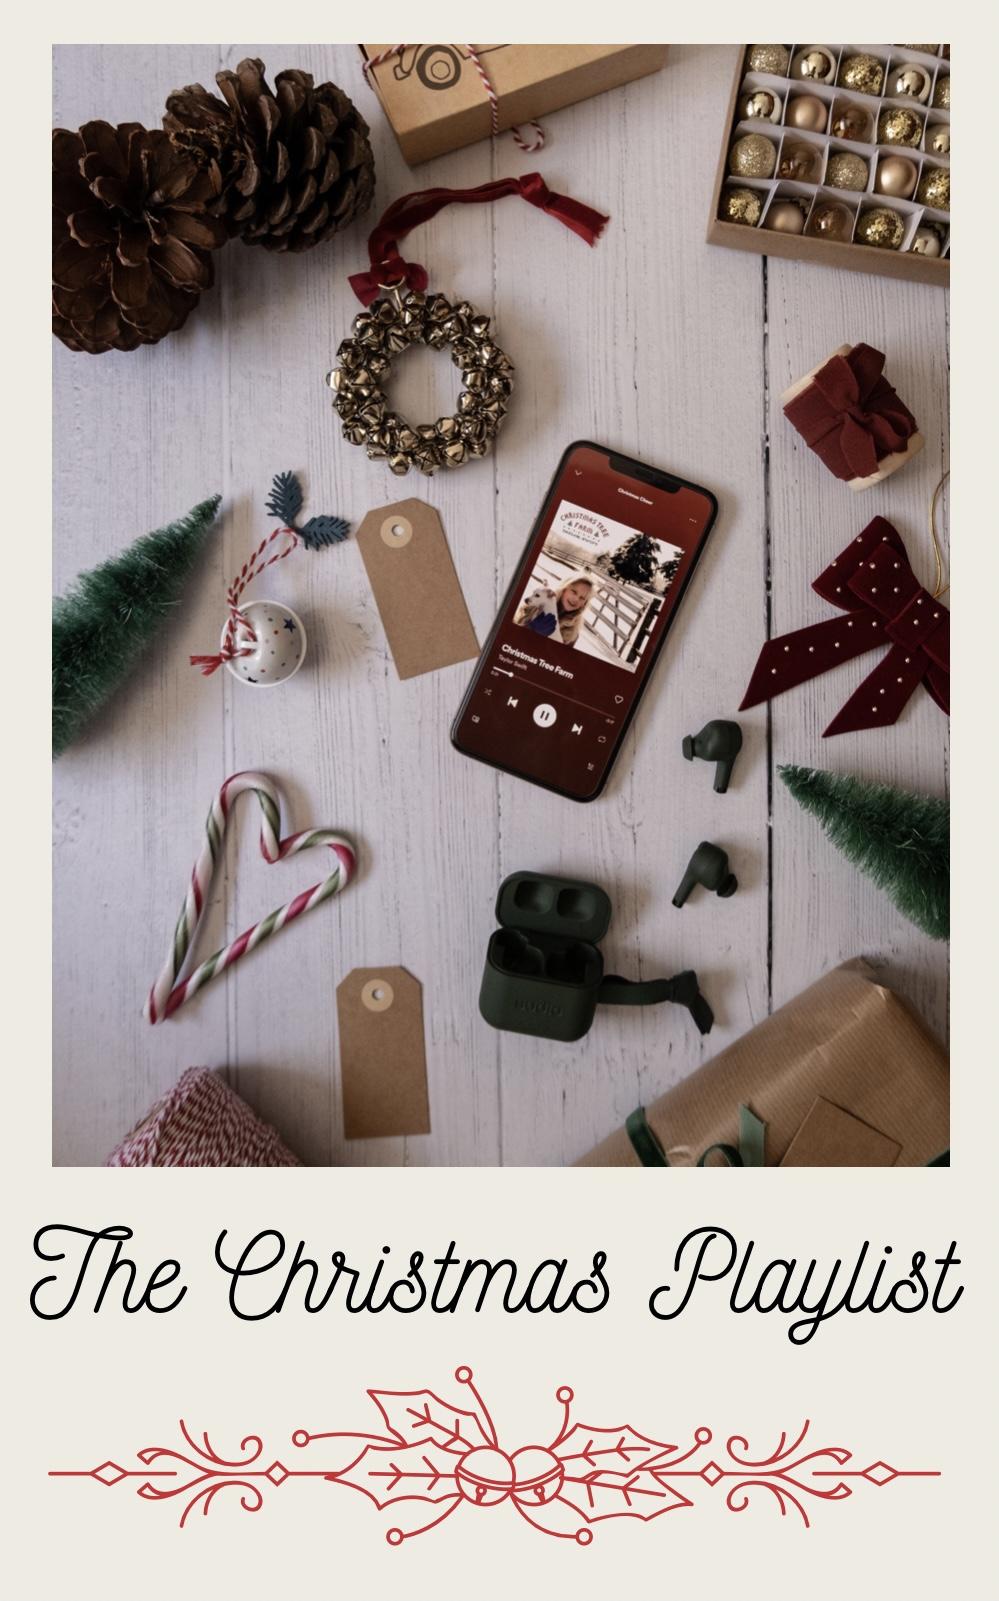 The 2020 Christmas Playlist